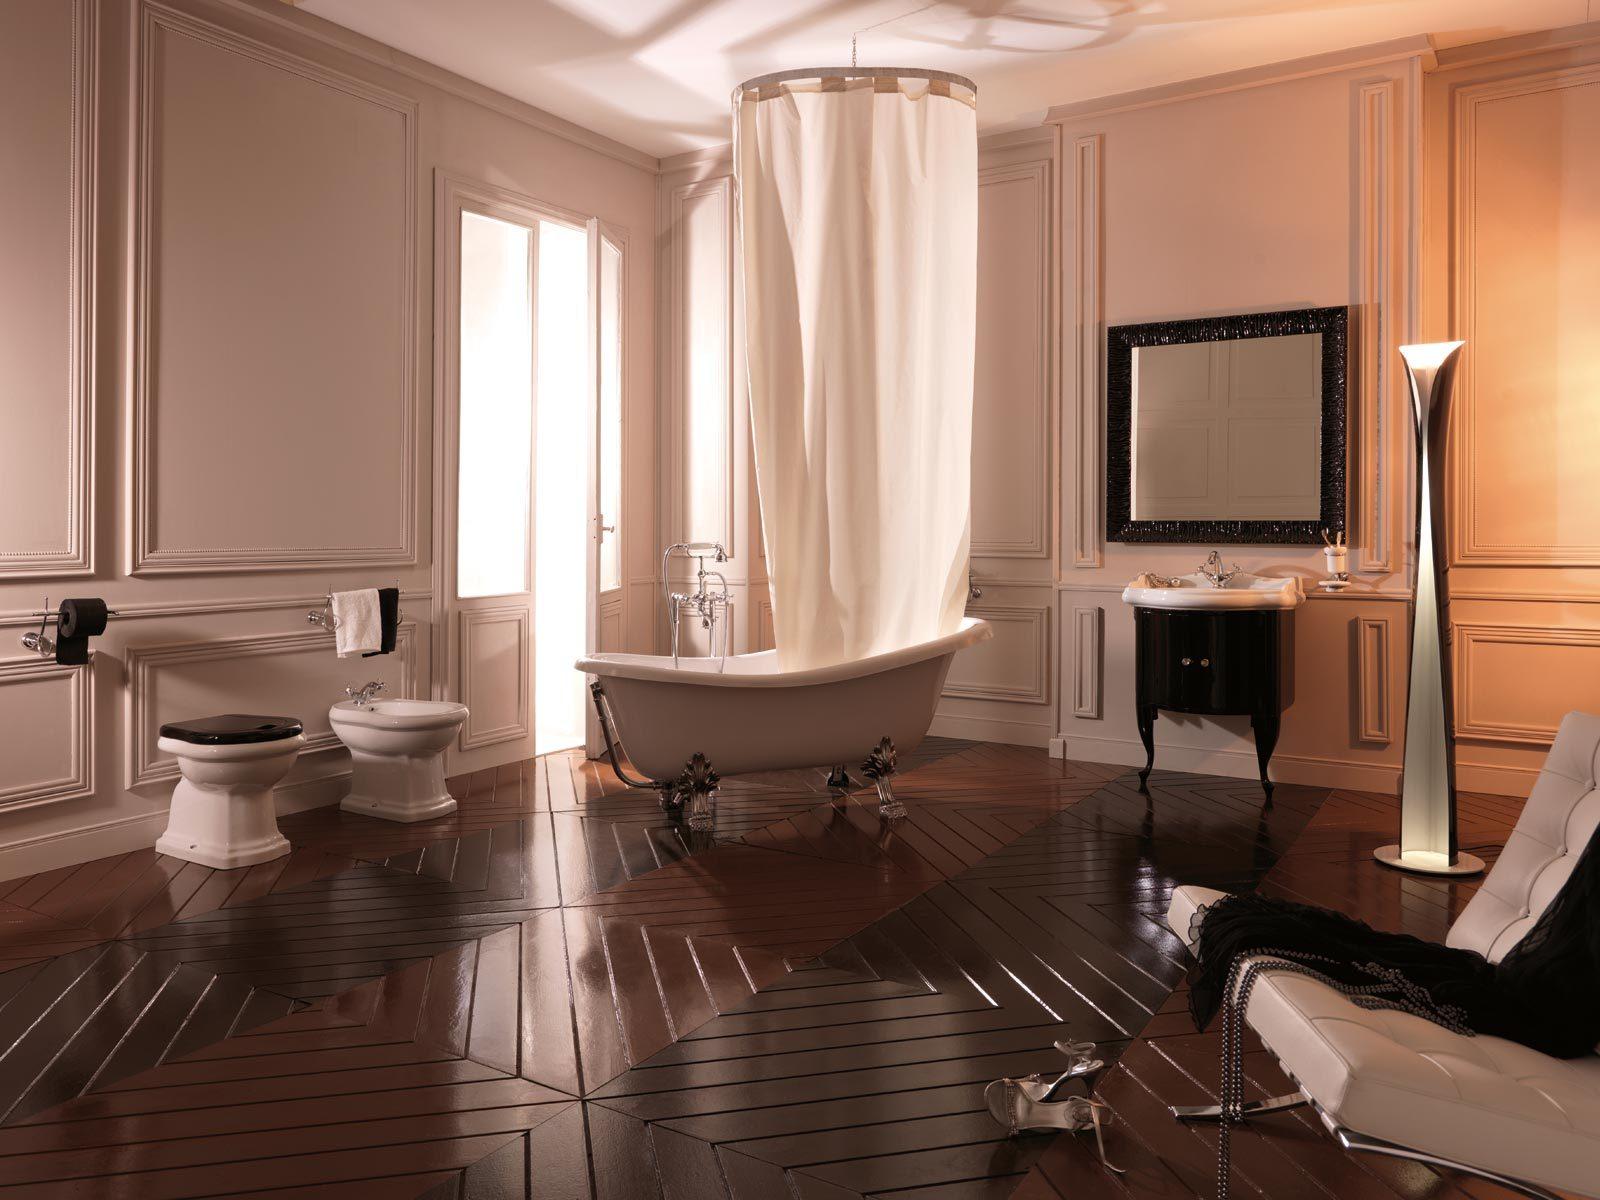 Retro Bad antik bad bilder badelaedchen